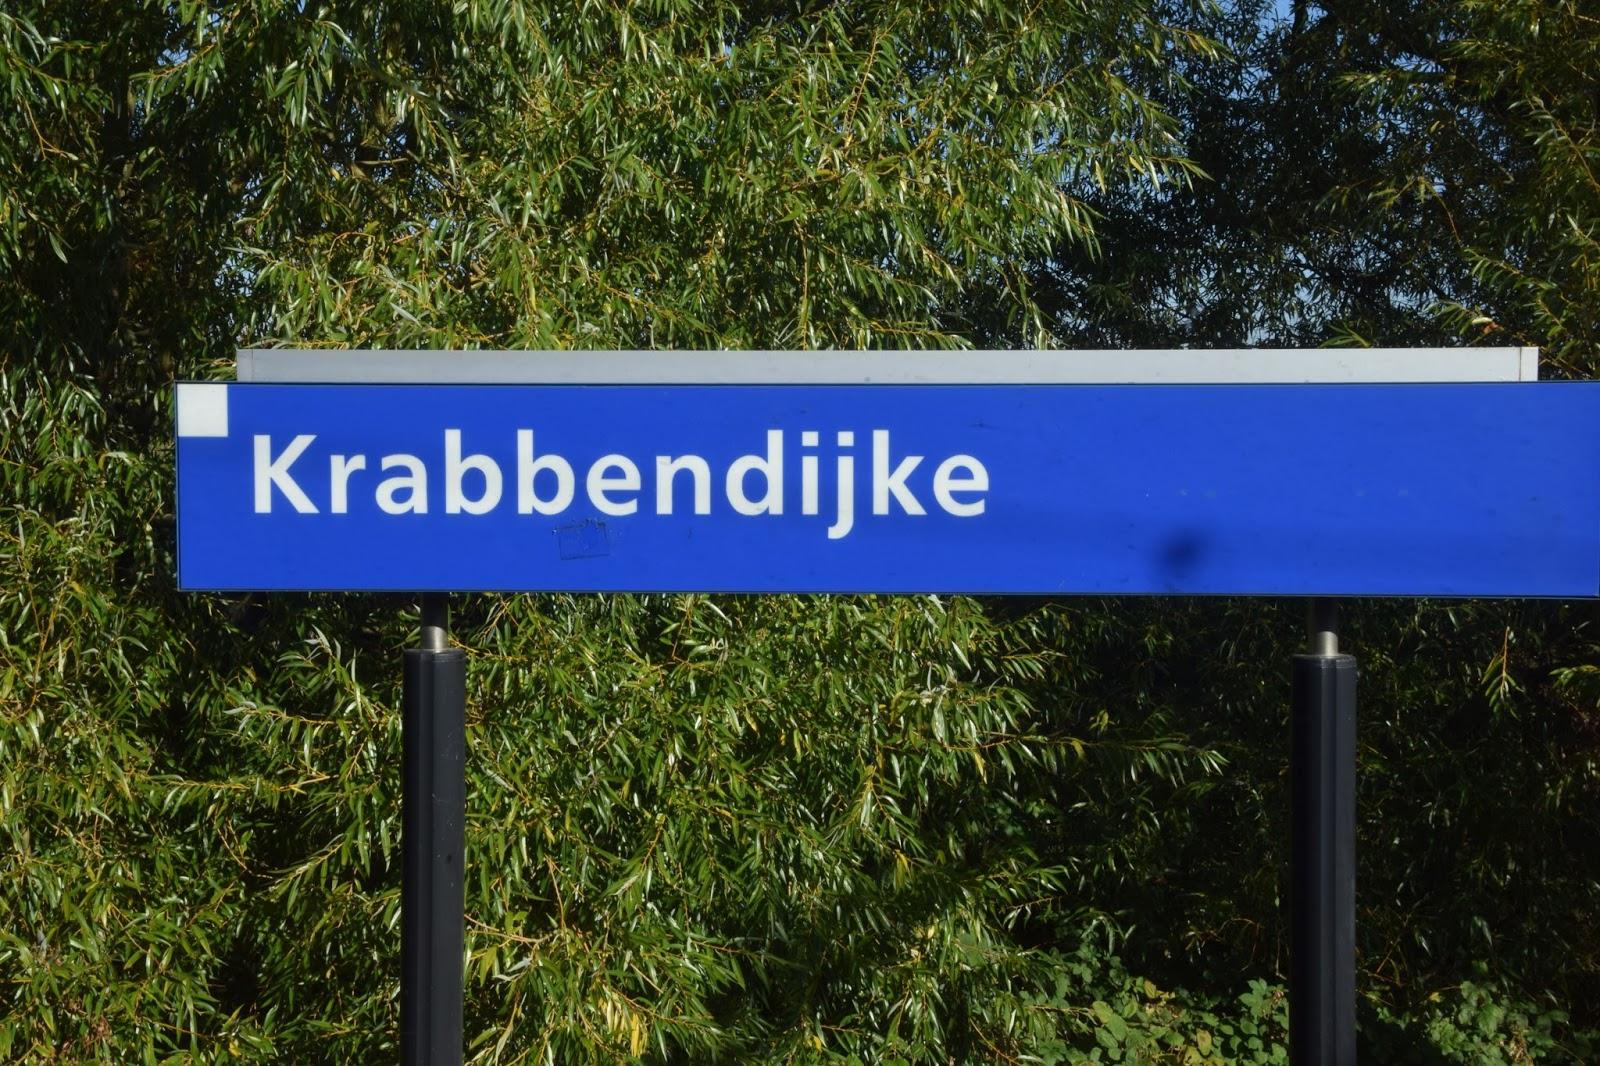 Krabbendijk w drodze do Middelburga